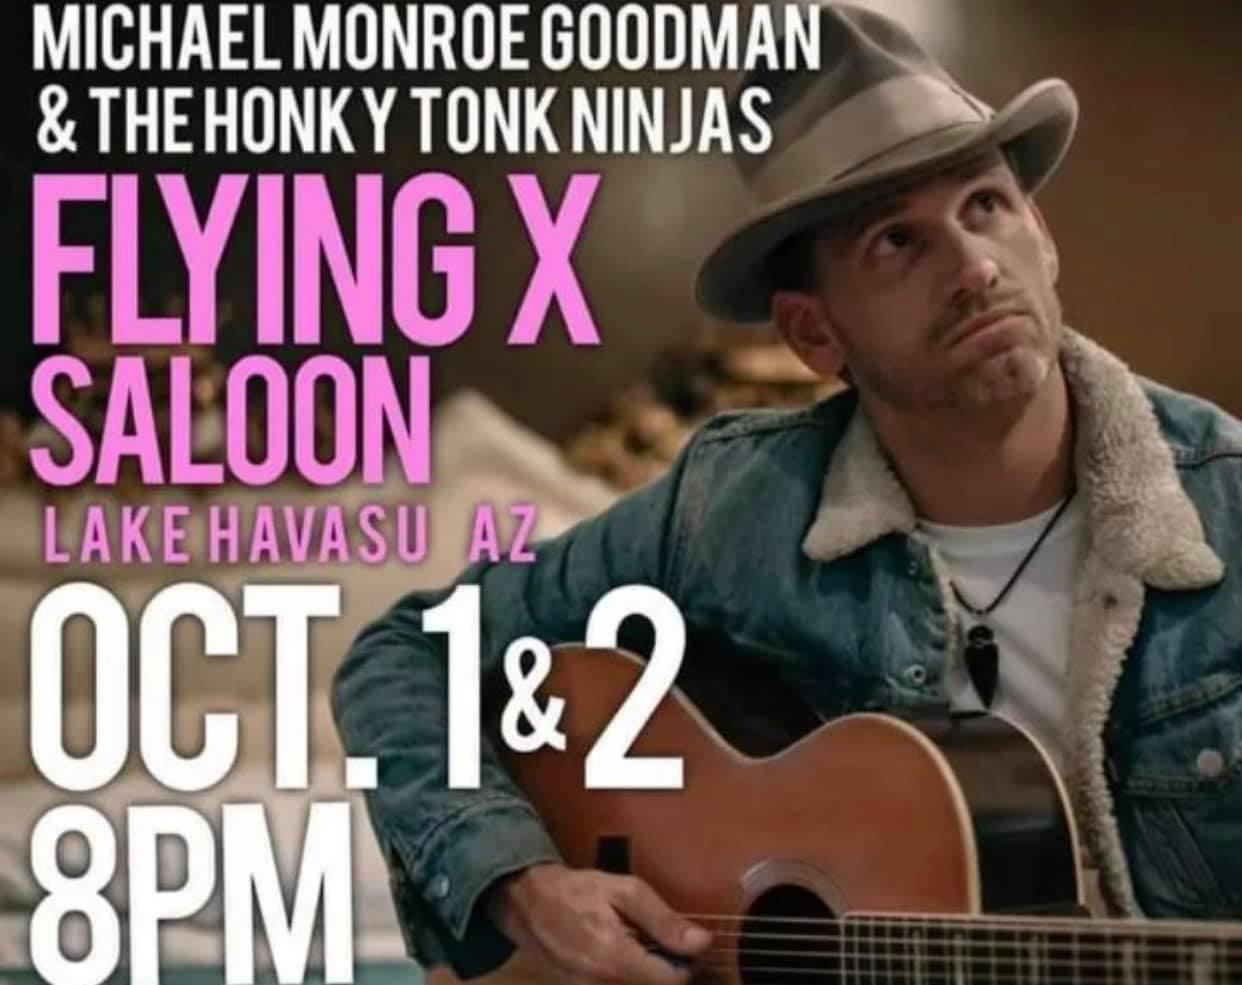 Michael Monroe Goodman And The Honky Tonk Ninjas At The Flying X Saloon